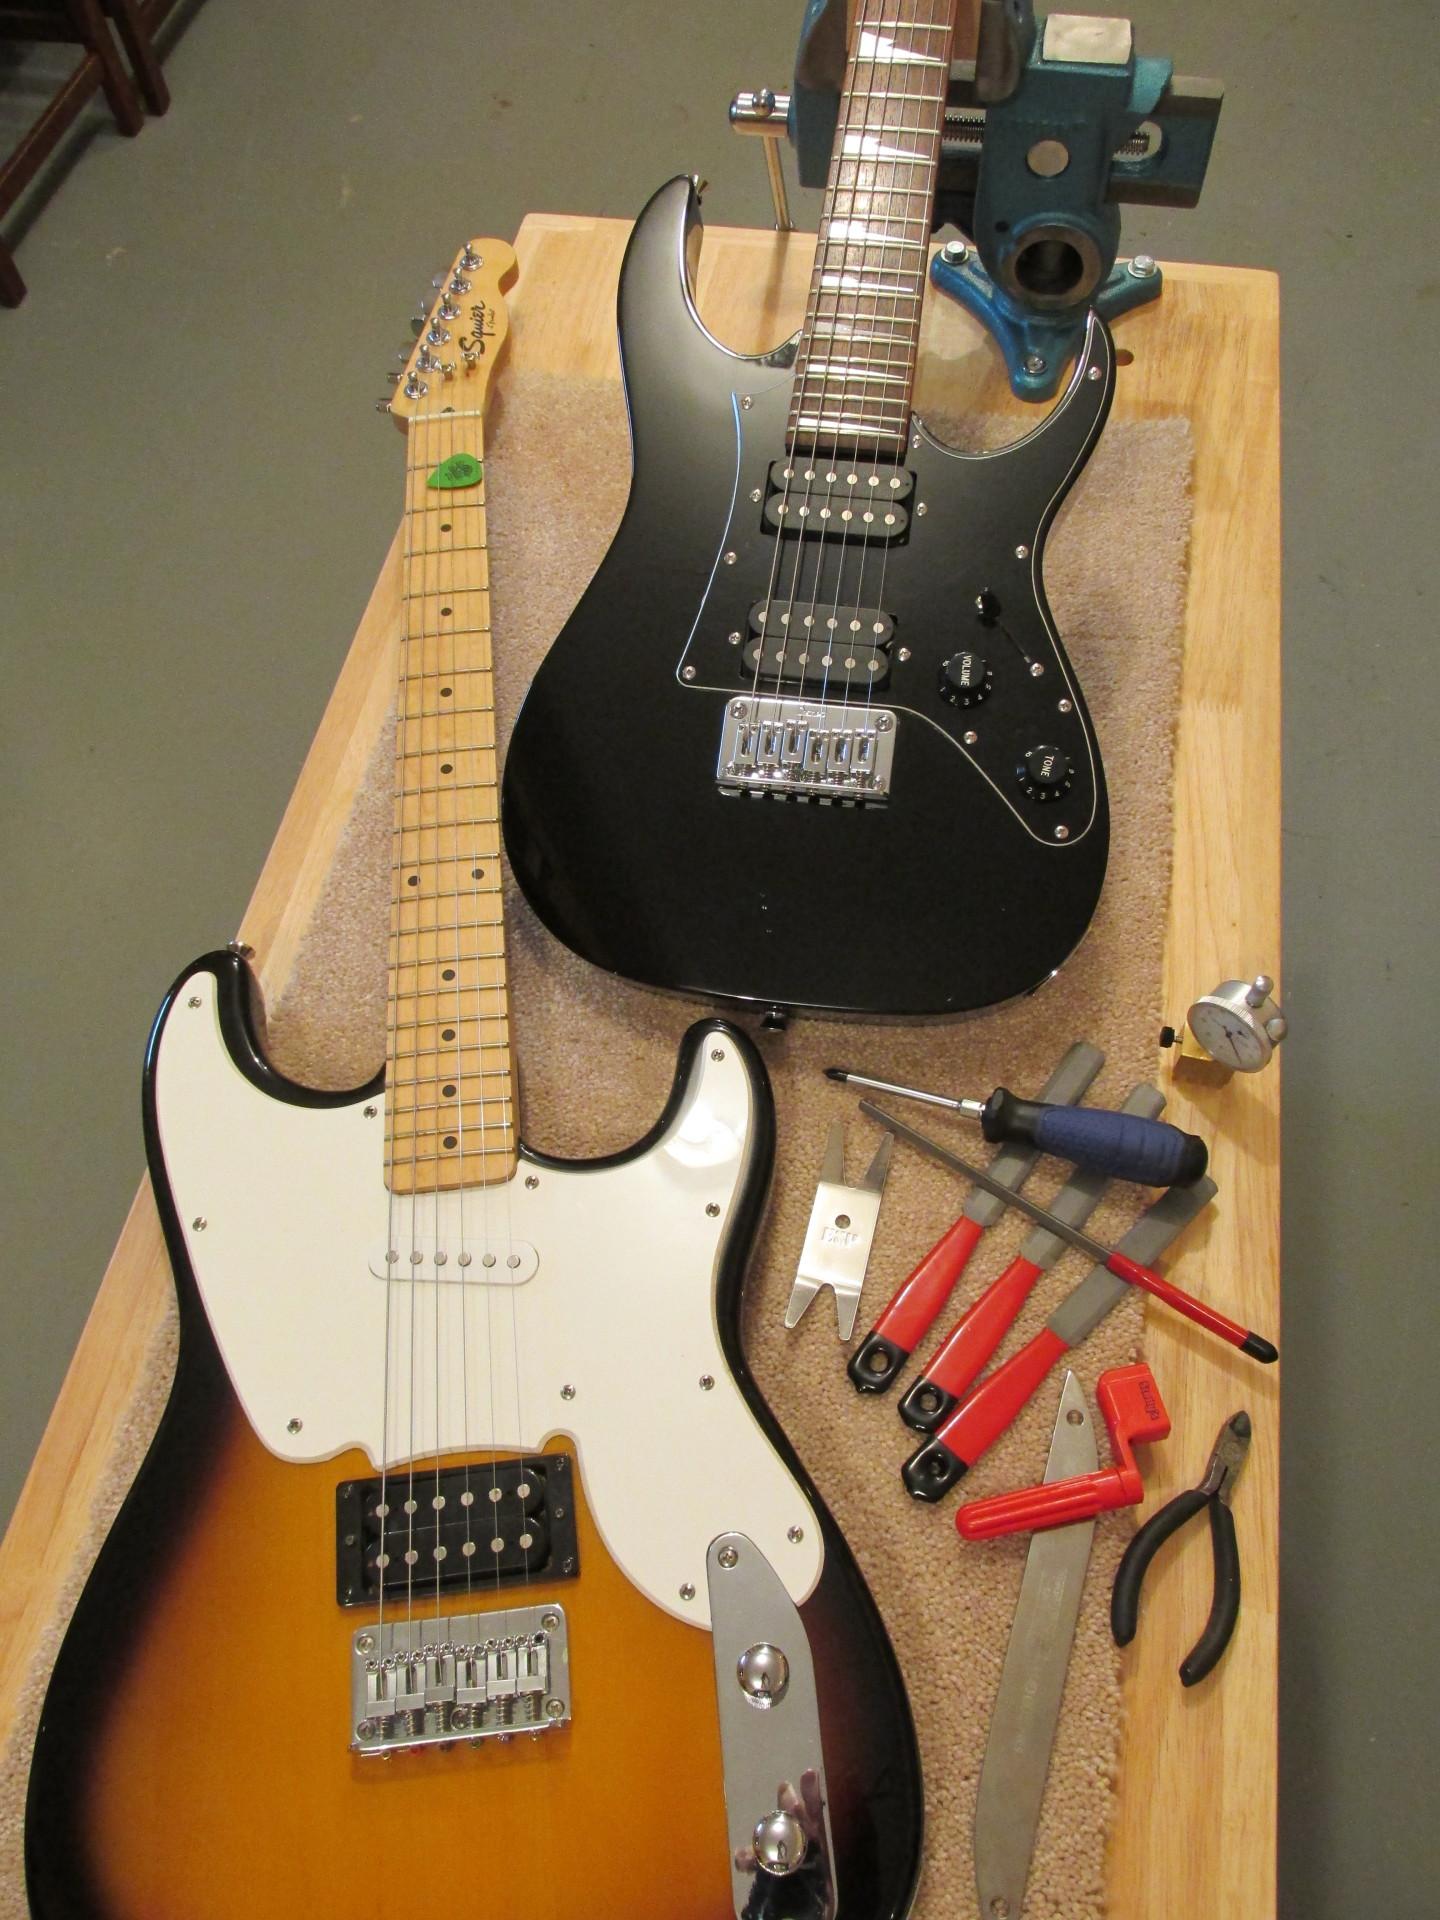 Entry-level guitars on The Fret Shack's workbench